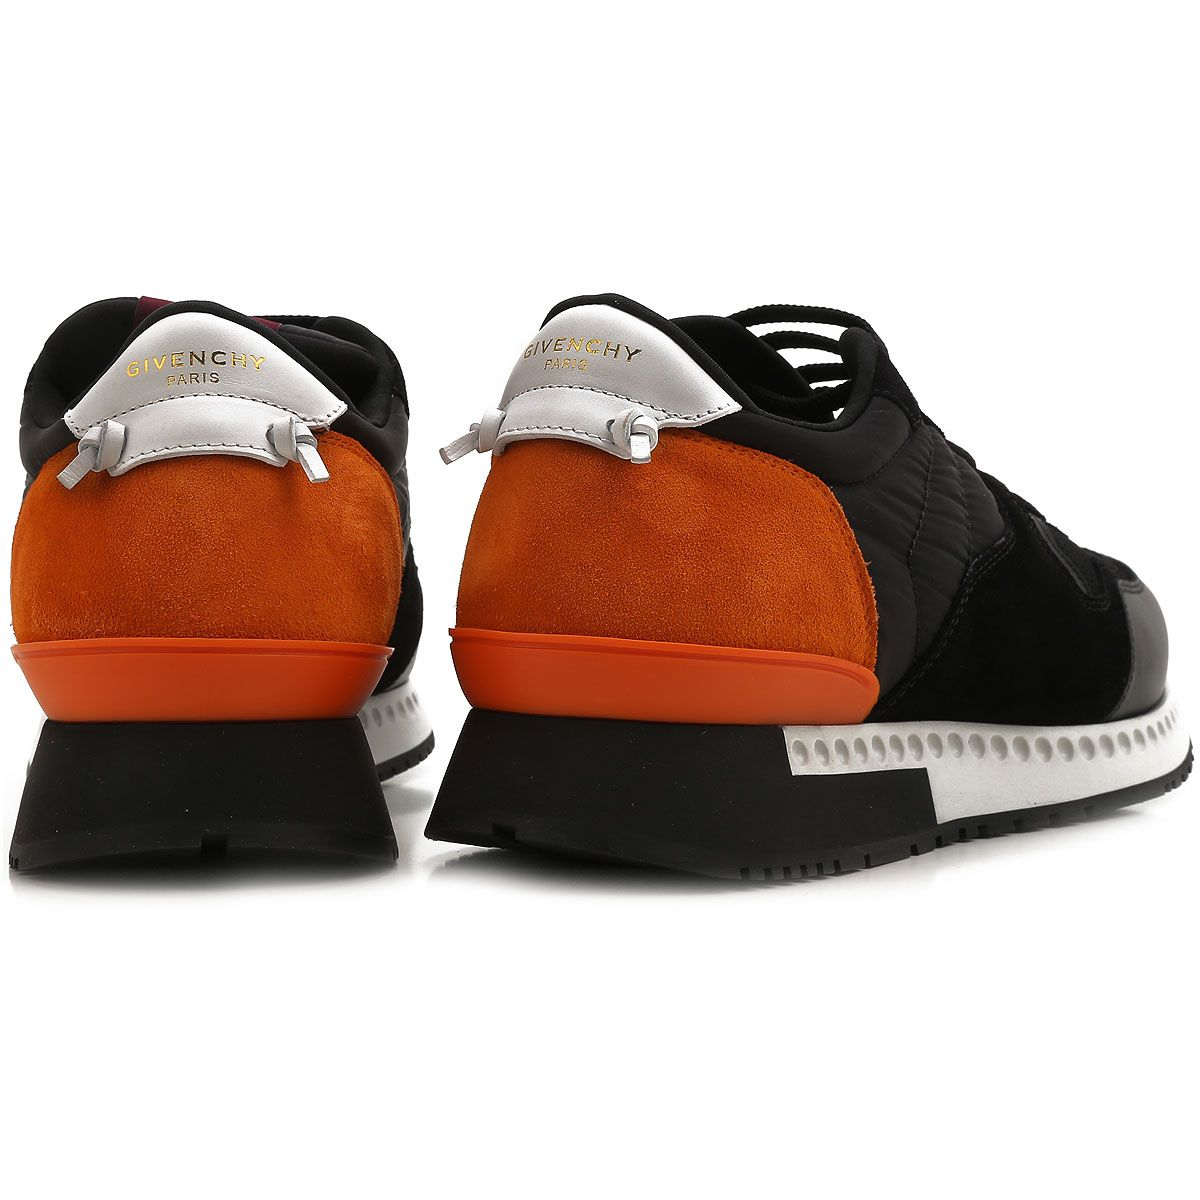 Acheter Chaussures homme Givenchy en Ligne |